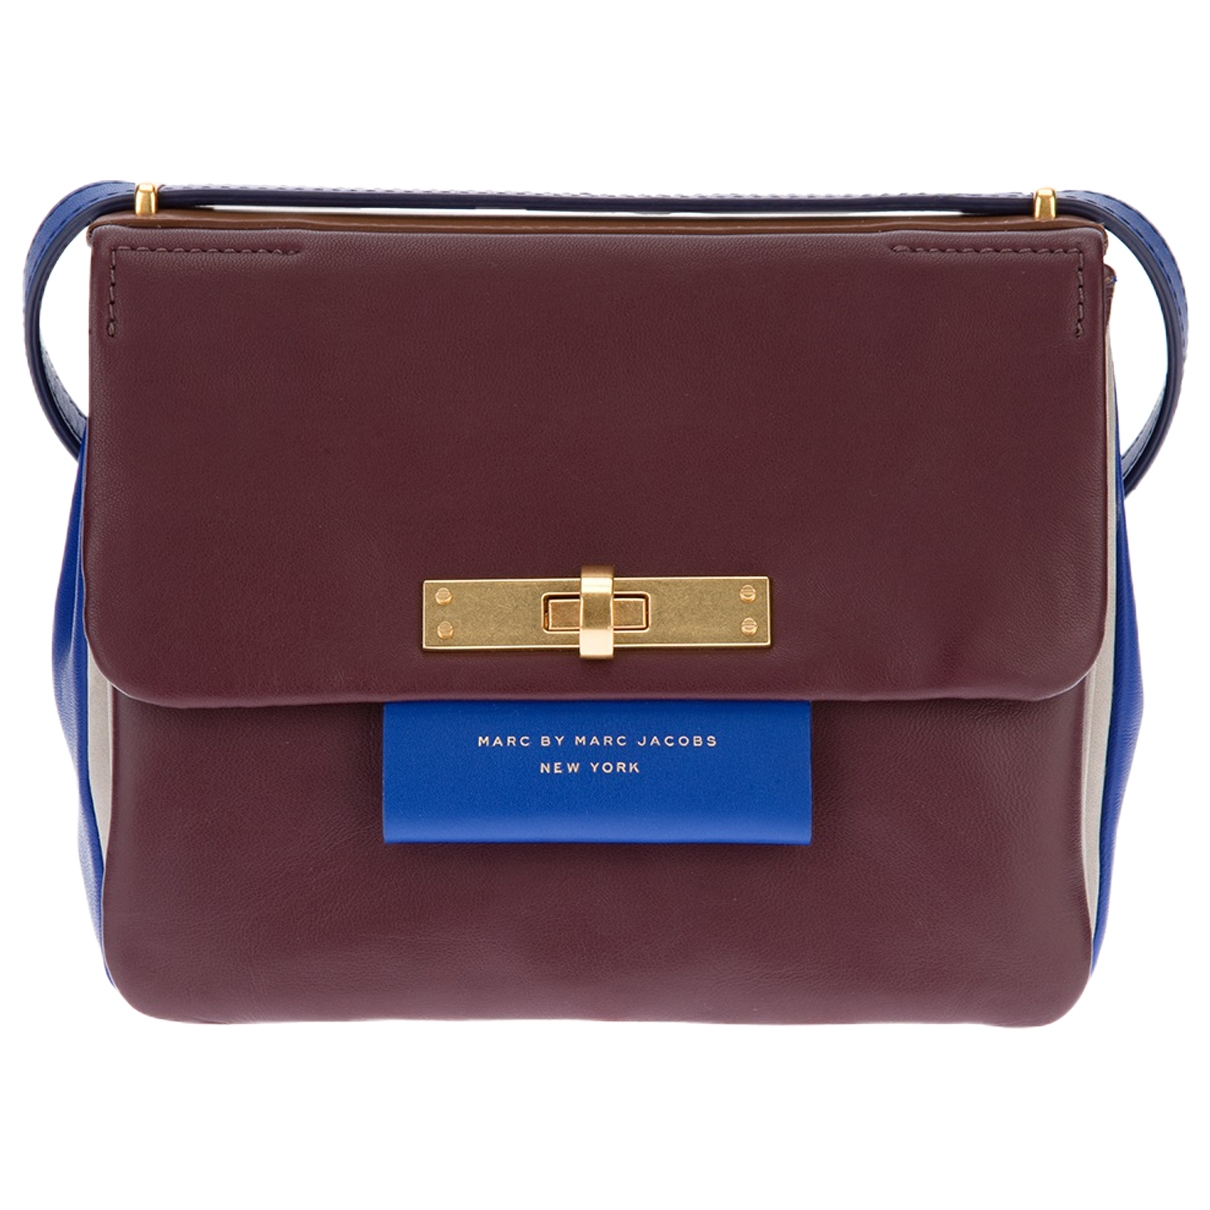 Marc By Marc Jacobs \N Burgundy Leather handbag for Women \N